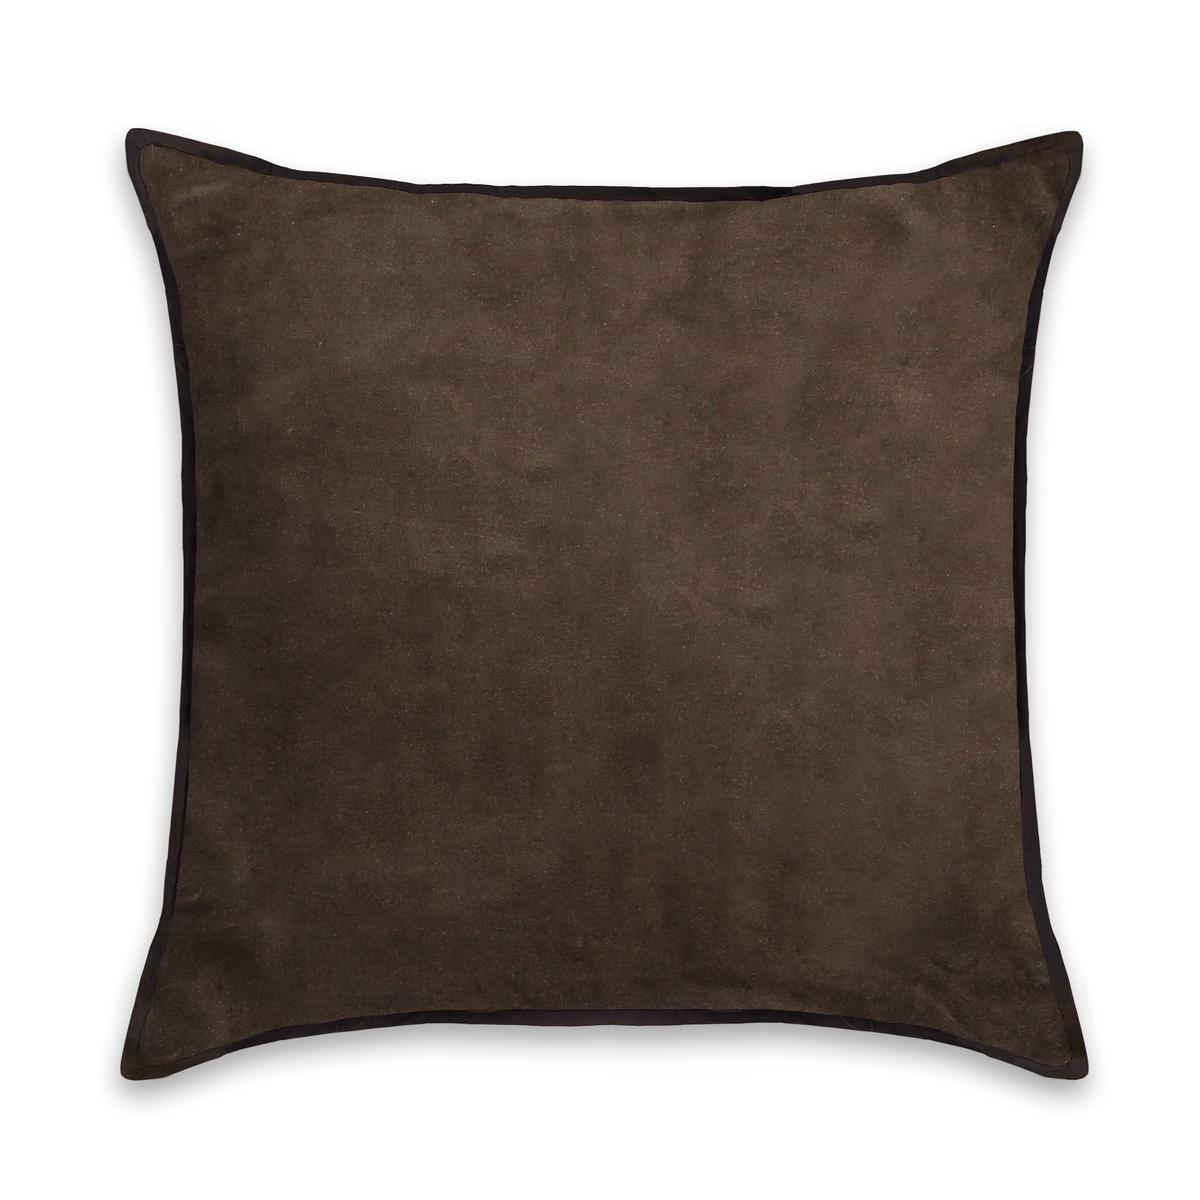 Чехол на подушку-валик из велюра, Vélivole